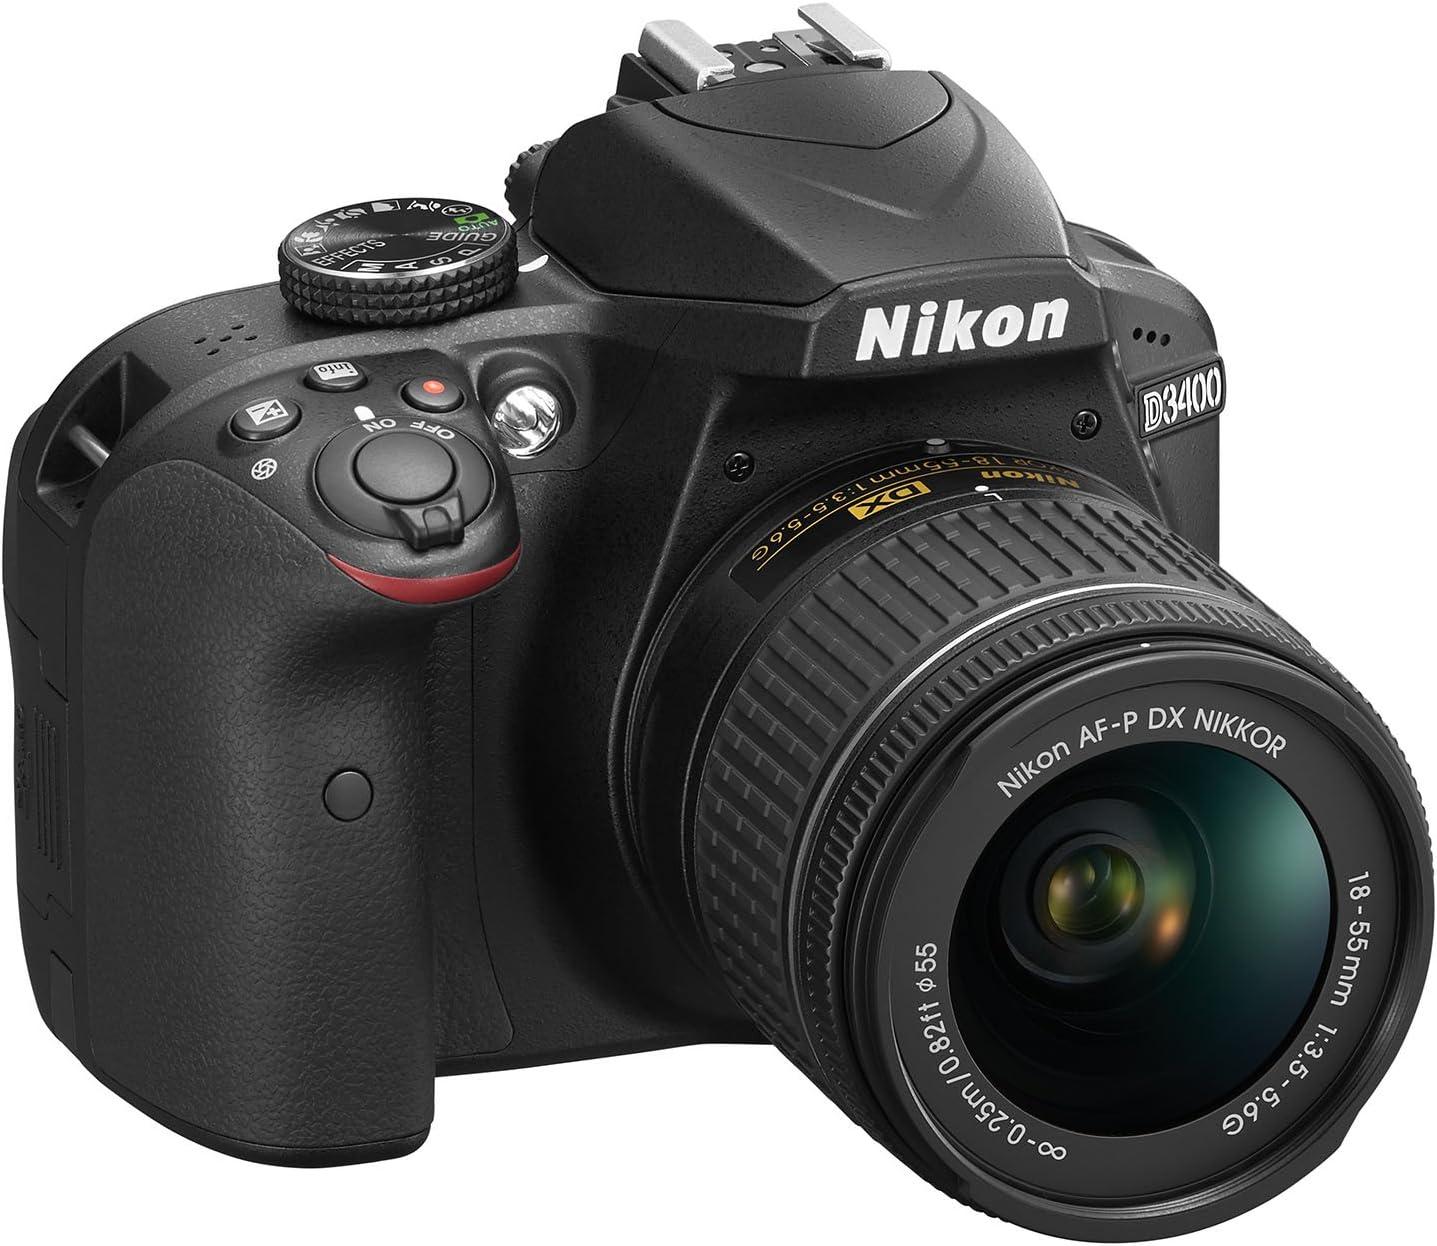 Nikon D3400 Digitales Spiegelreflexkamera Mit Objektiv Kamera